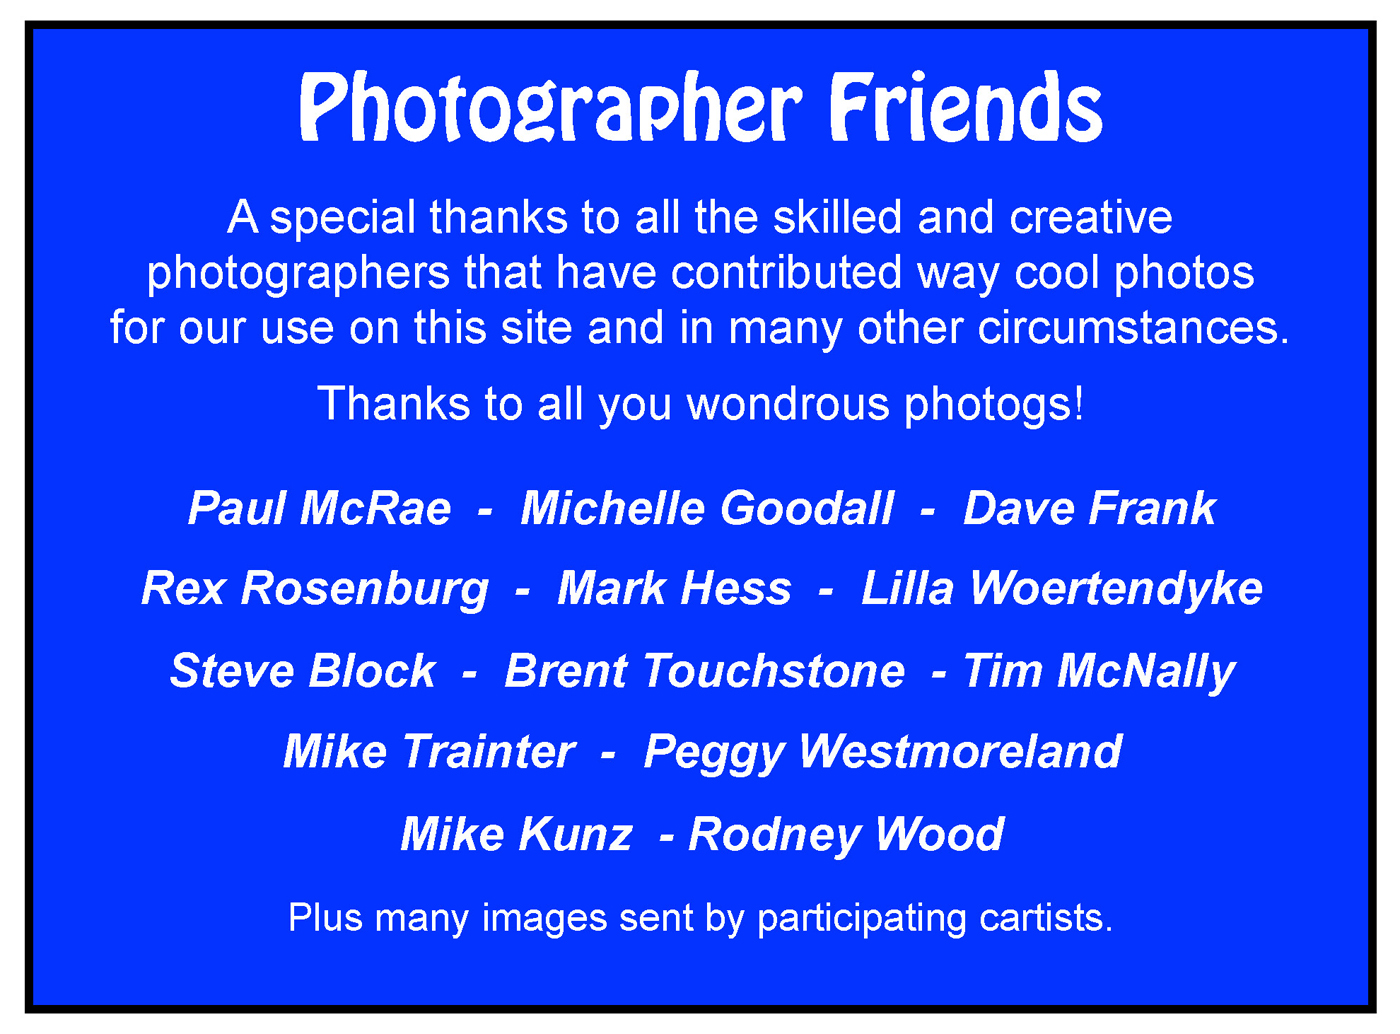 Photographer Friends of ArtoCade